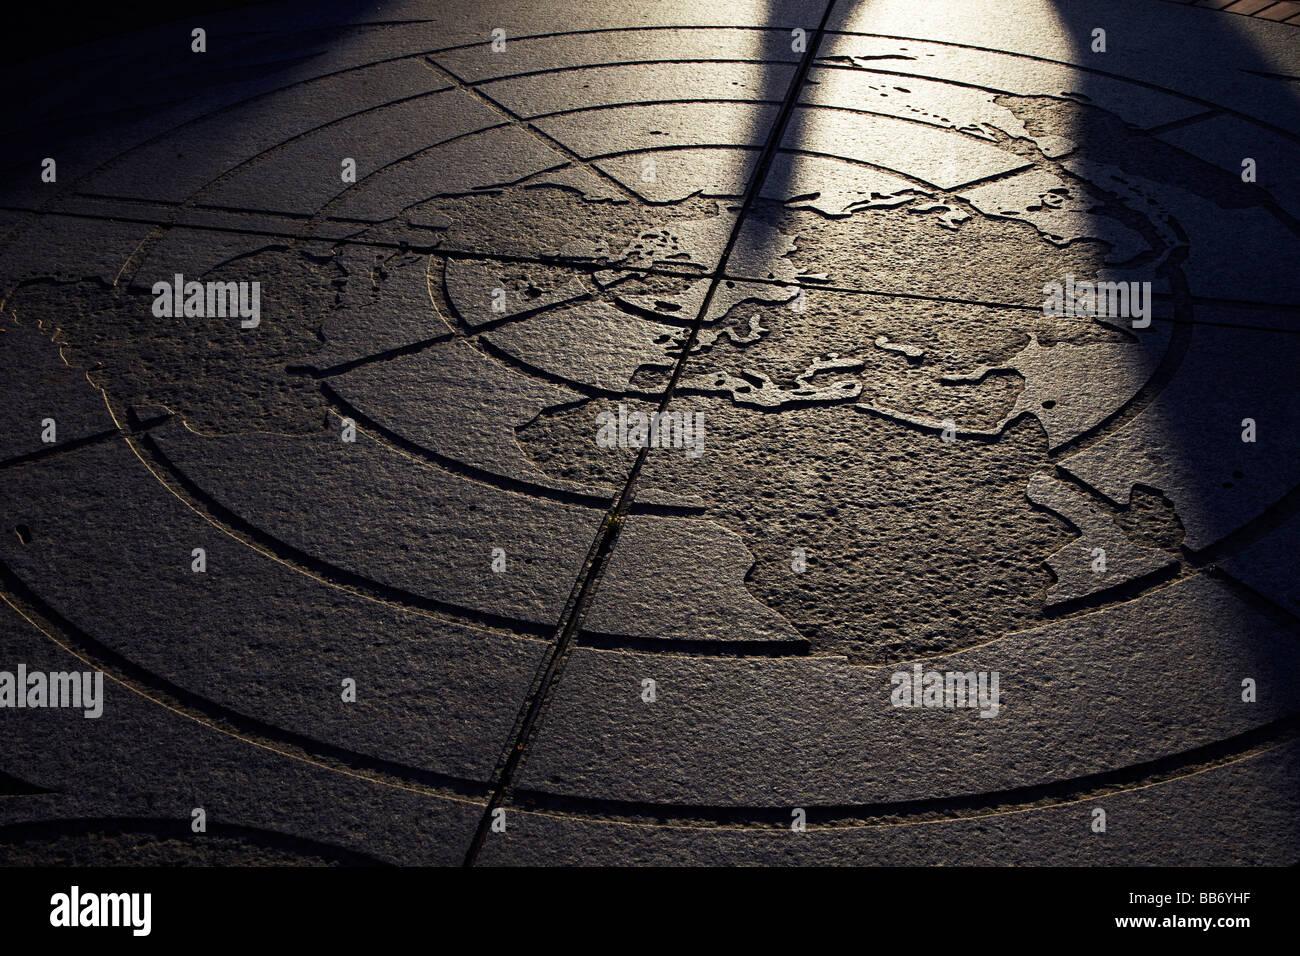 world map engraved on concrete sidewalk - Stock Image